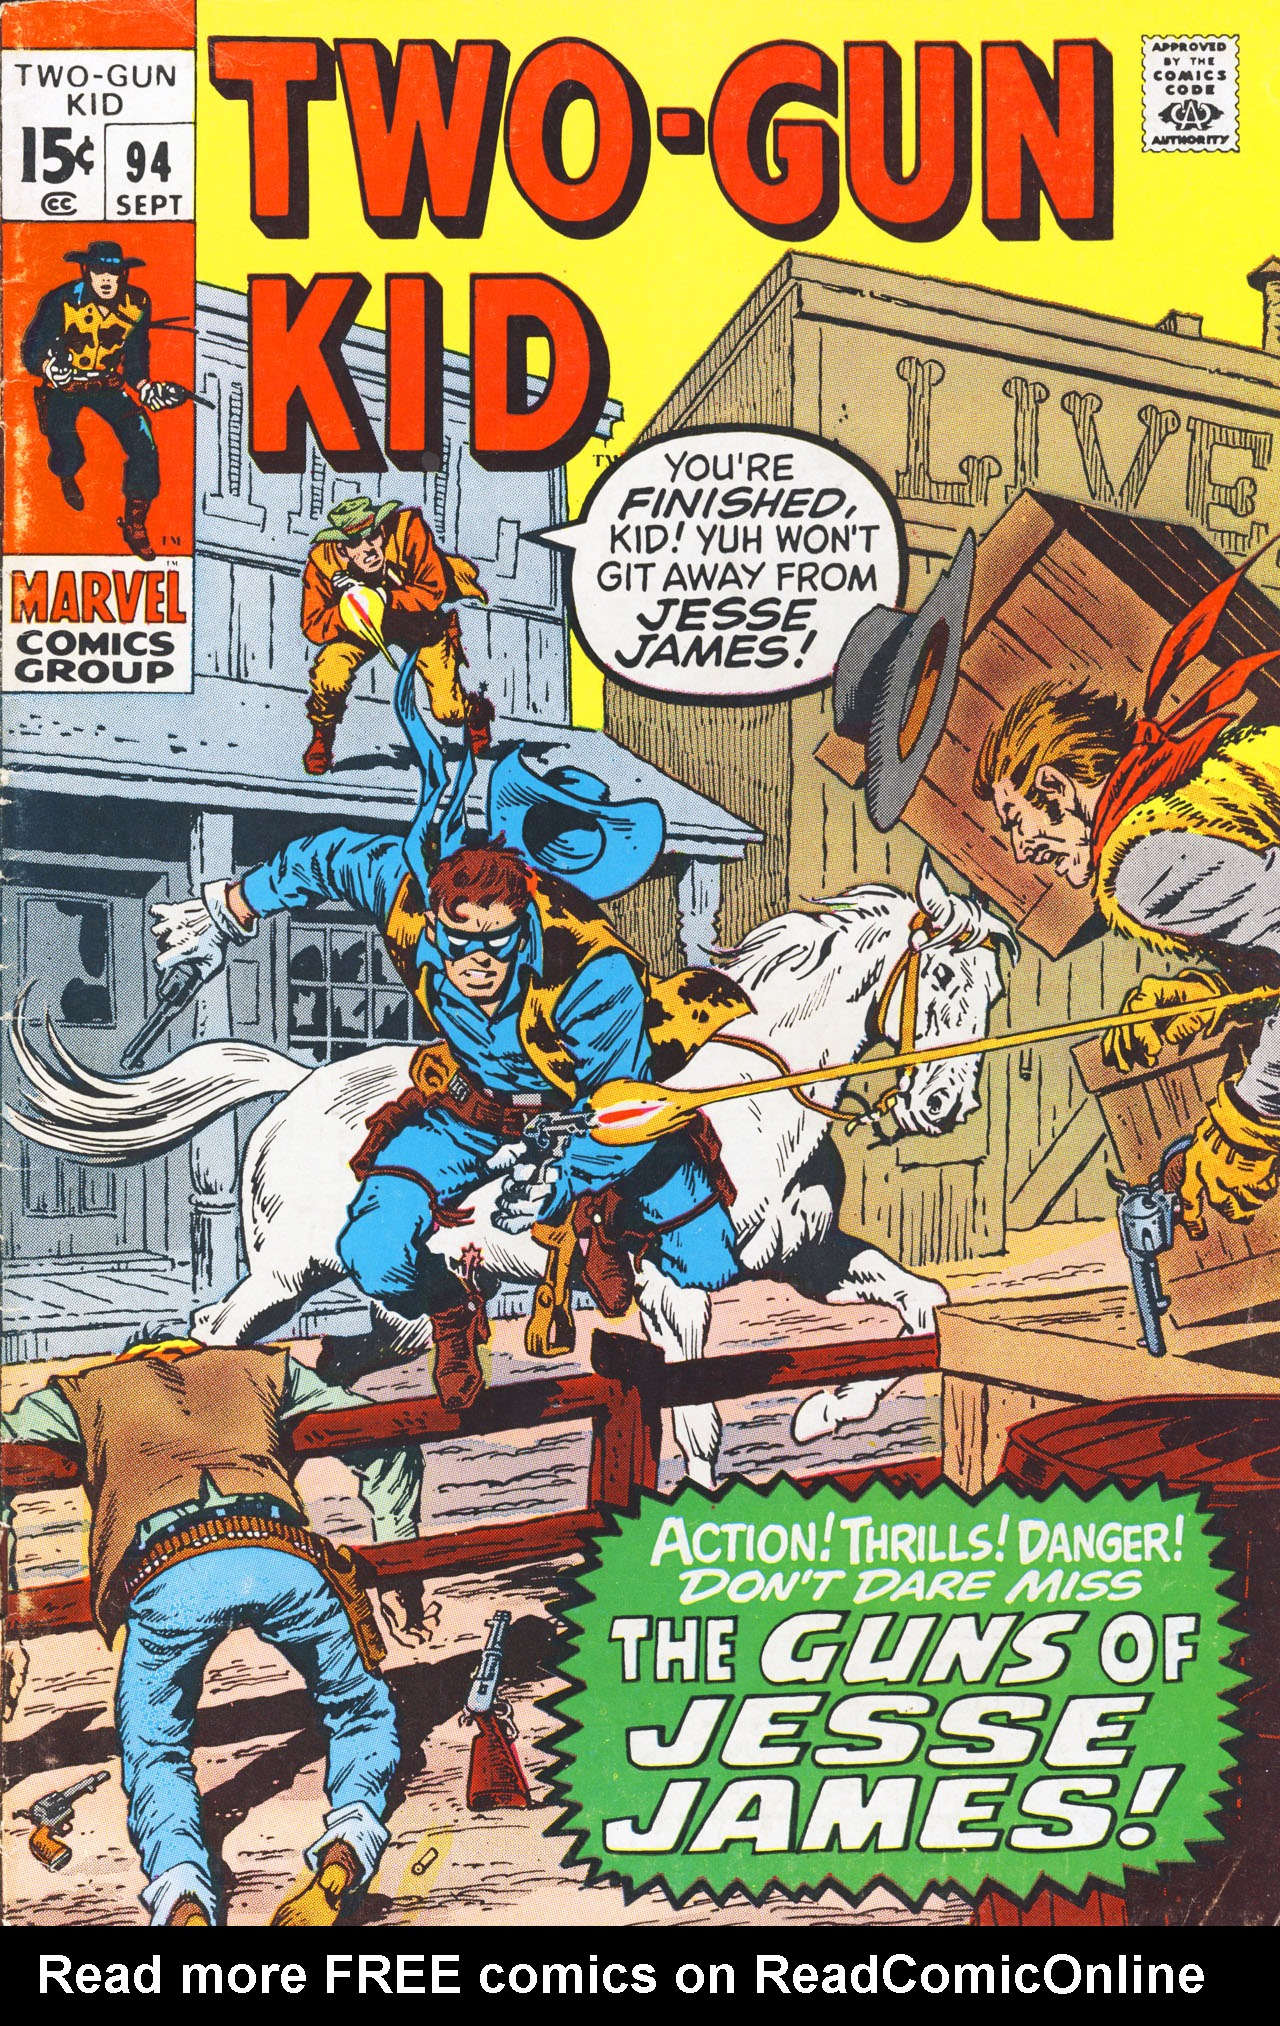 Read online Two-Gun Kid comic -  Issue #94 - 1